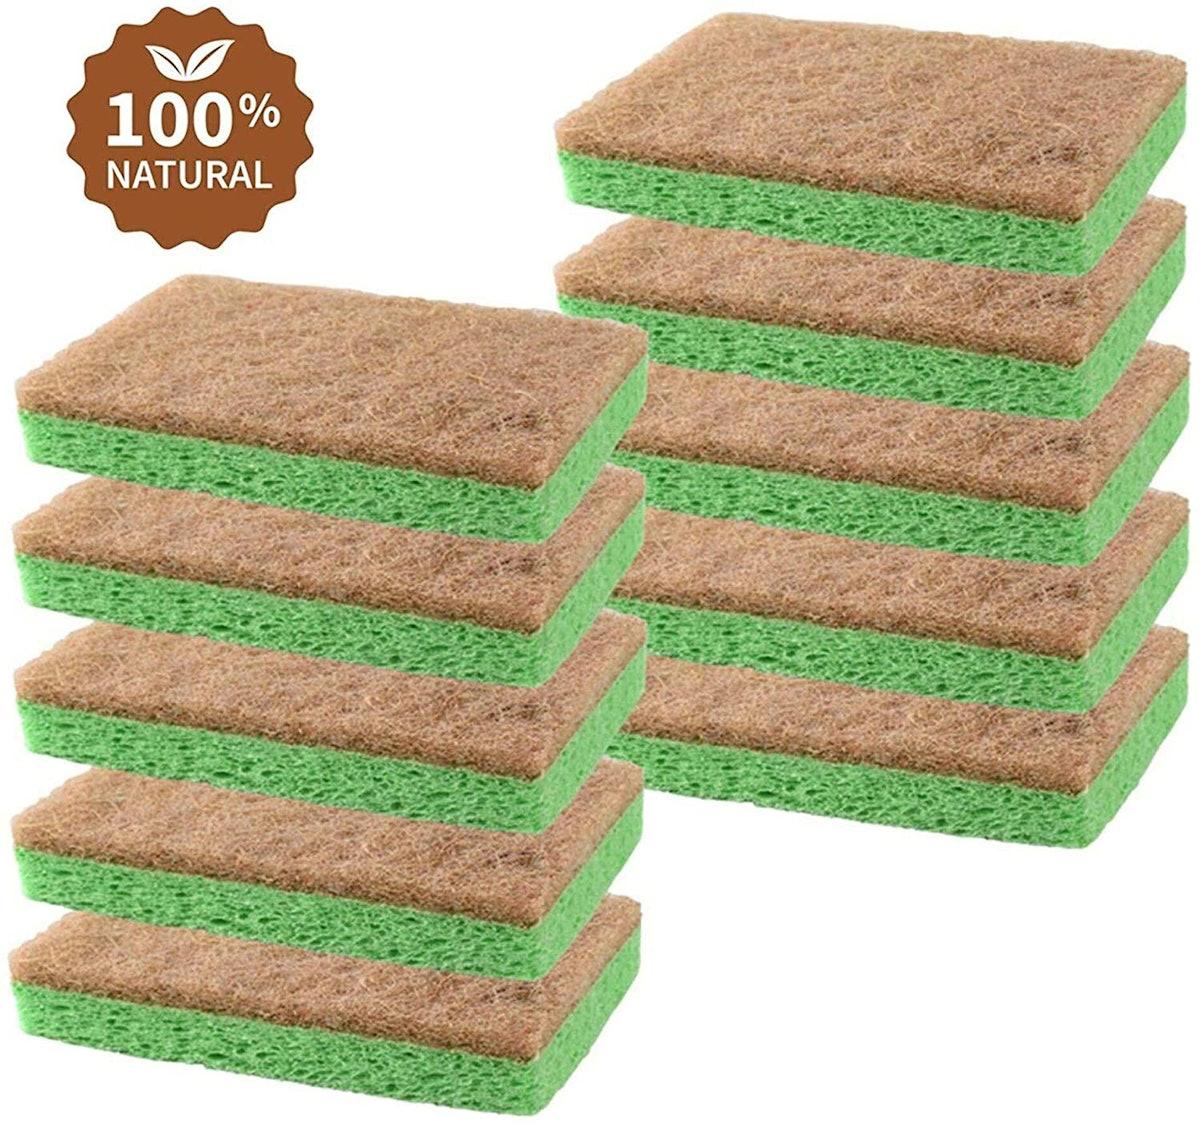 Scrub-it Natural Plant-Based Scrub Sponge (10-Pack)